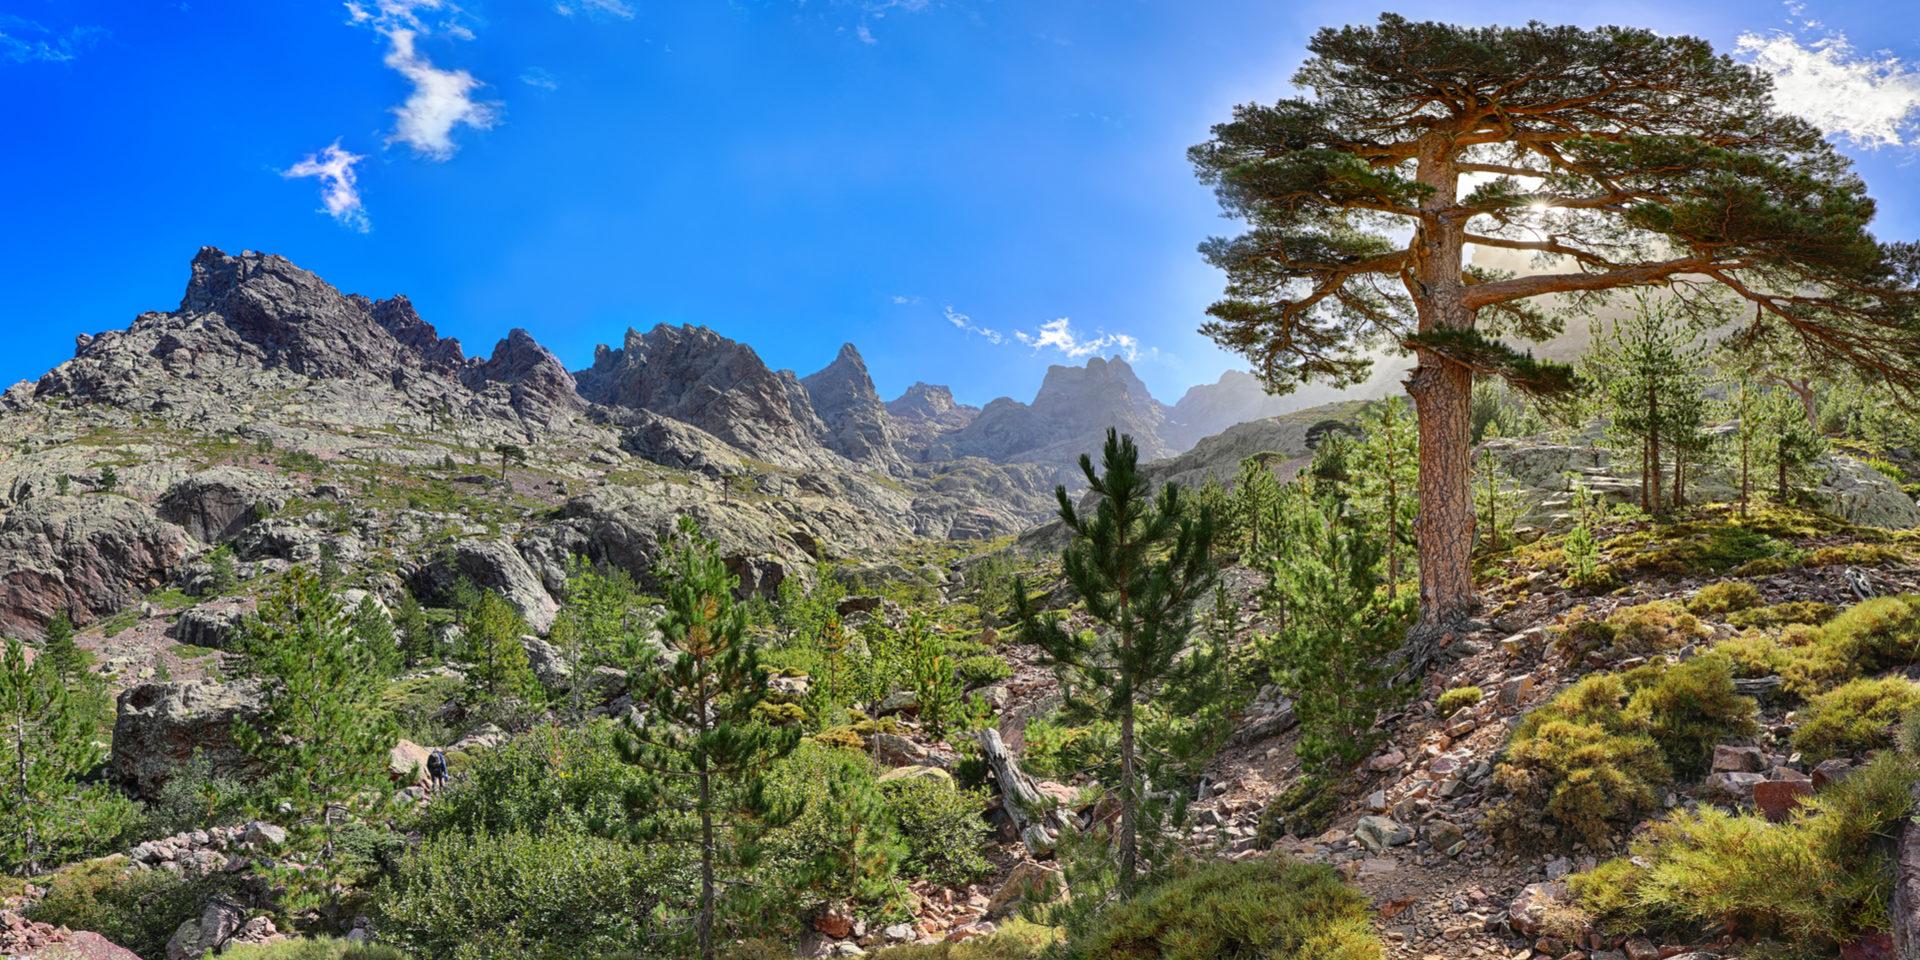 GR20 Asco Corsica Frankrijk hiking-trail wandelpad vallei